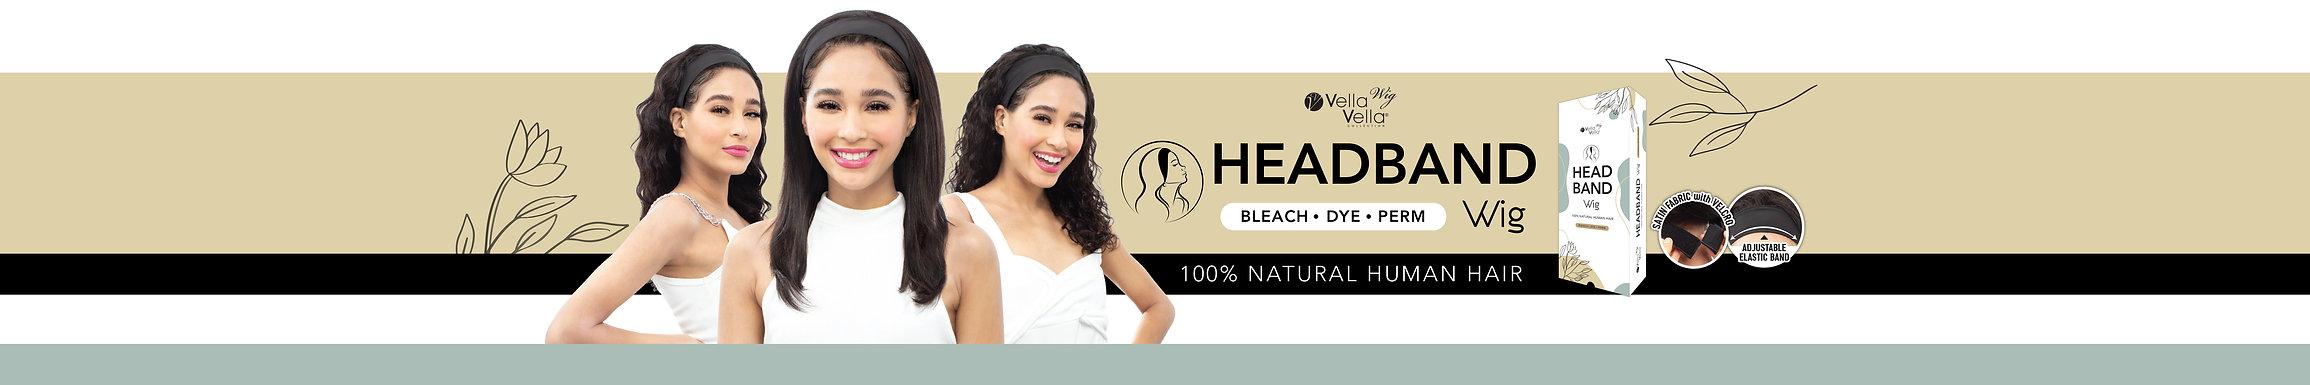 shop-HH Head Band wig.jpg